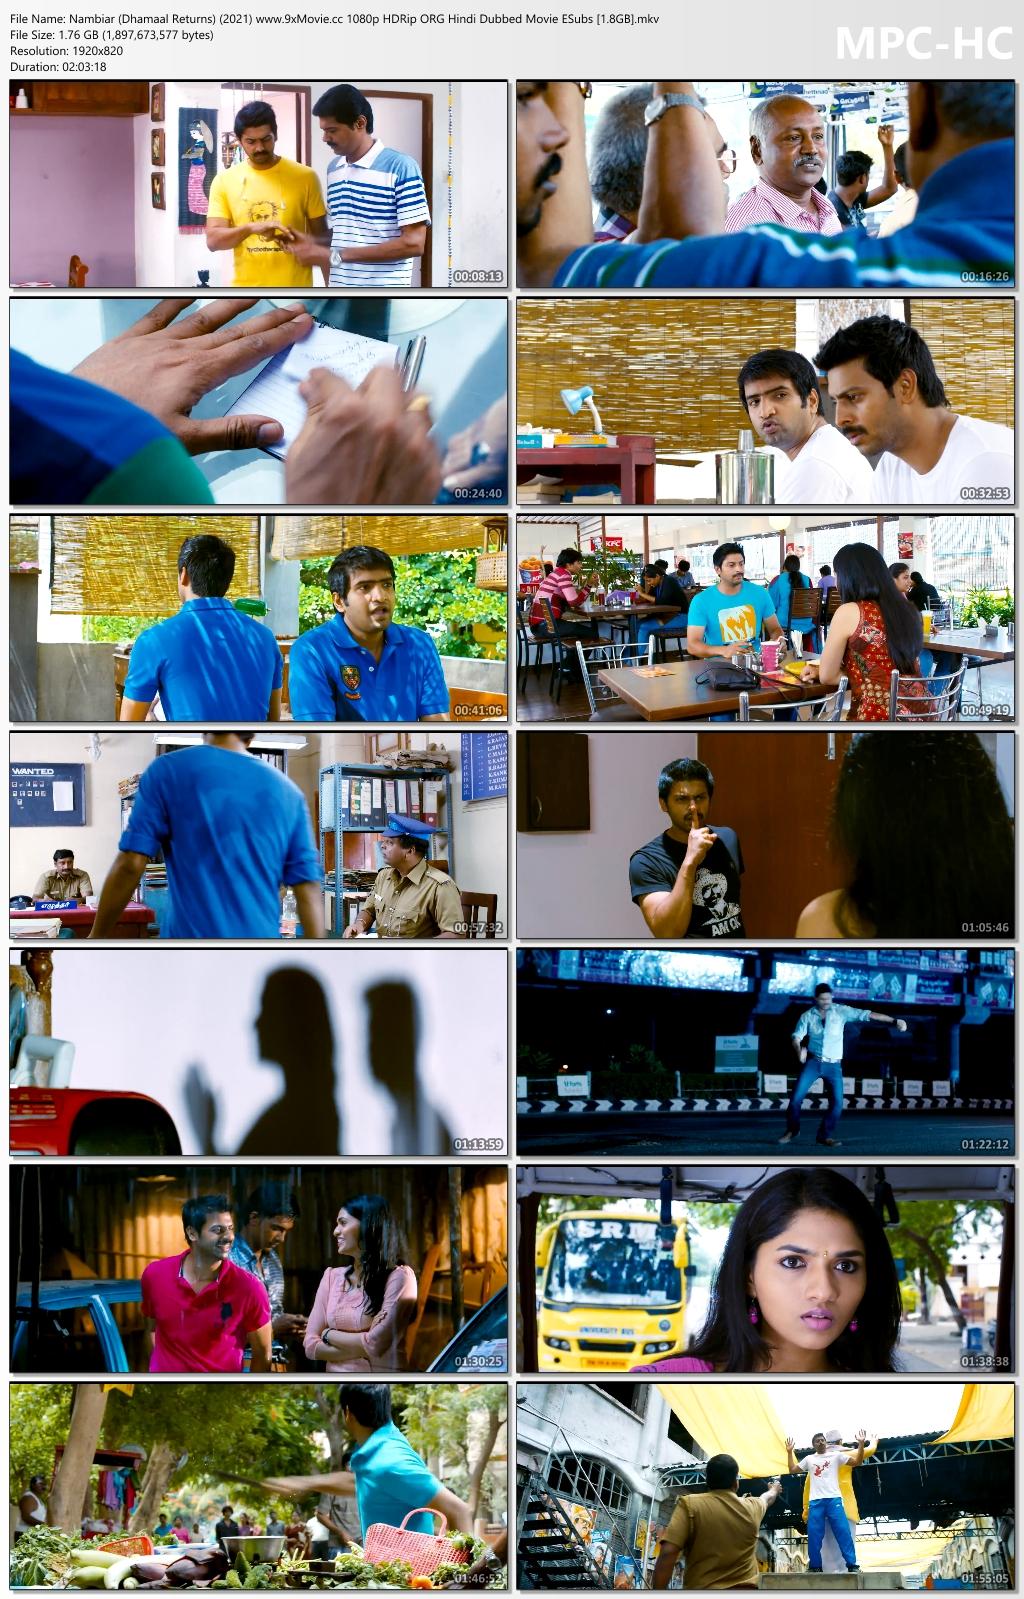 Nambiar-Dhamaal-Returns-2021-www-9x-Movie-cc-1080p-HDRip-ORG-Hindi-Dubbed-Movie-ESubs-1-8-GB-mkv